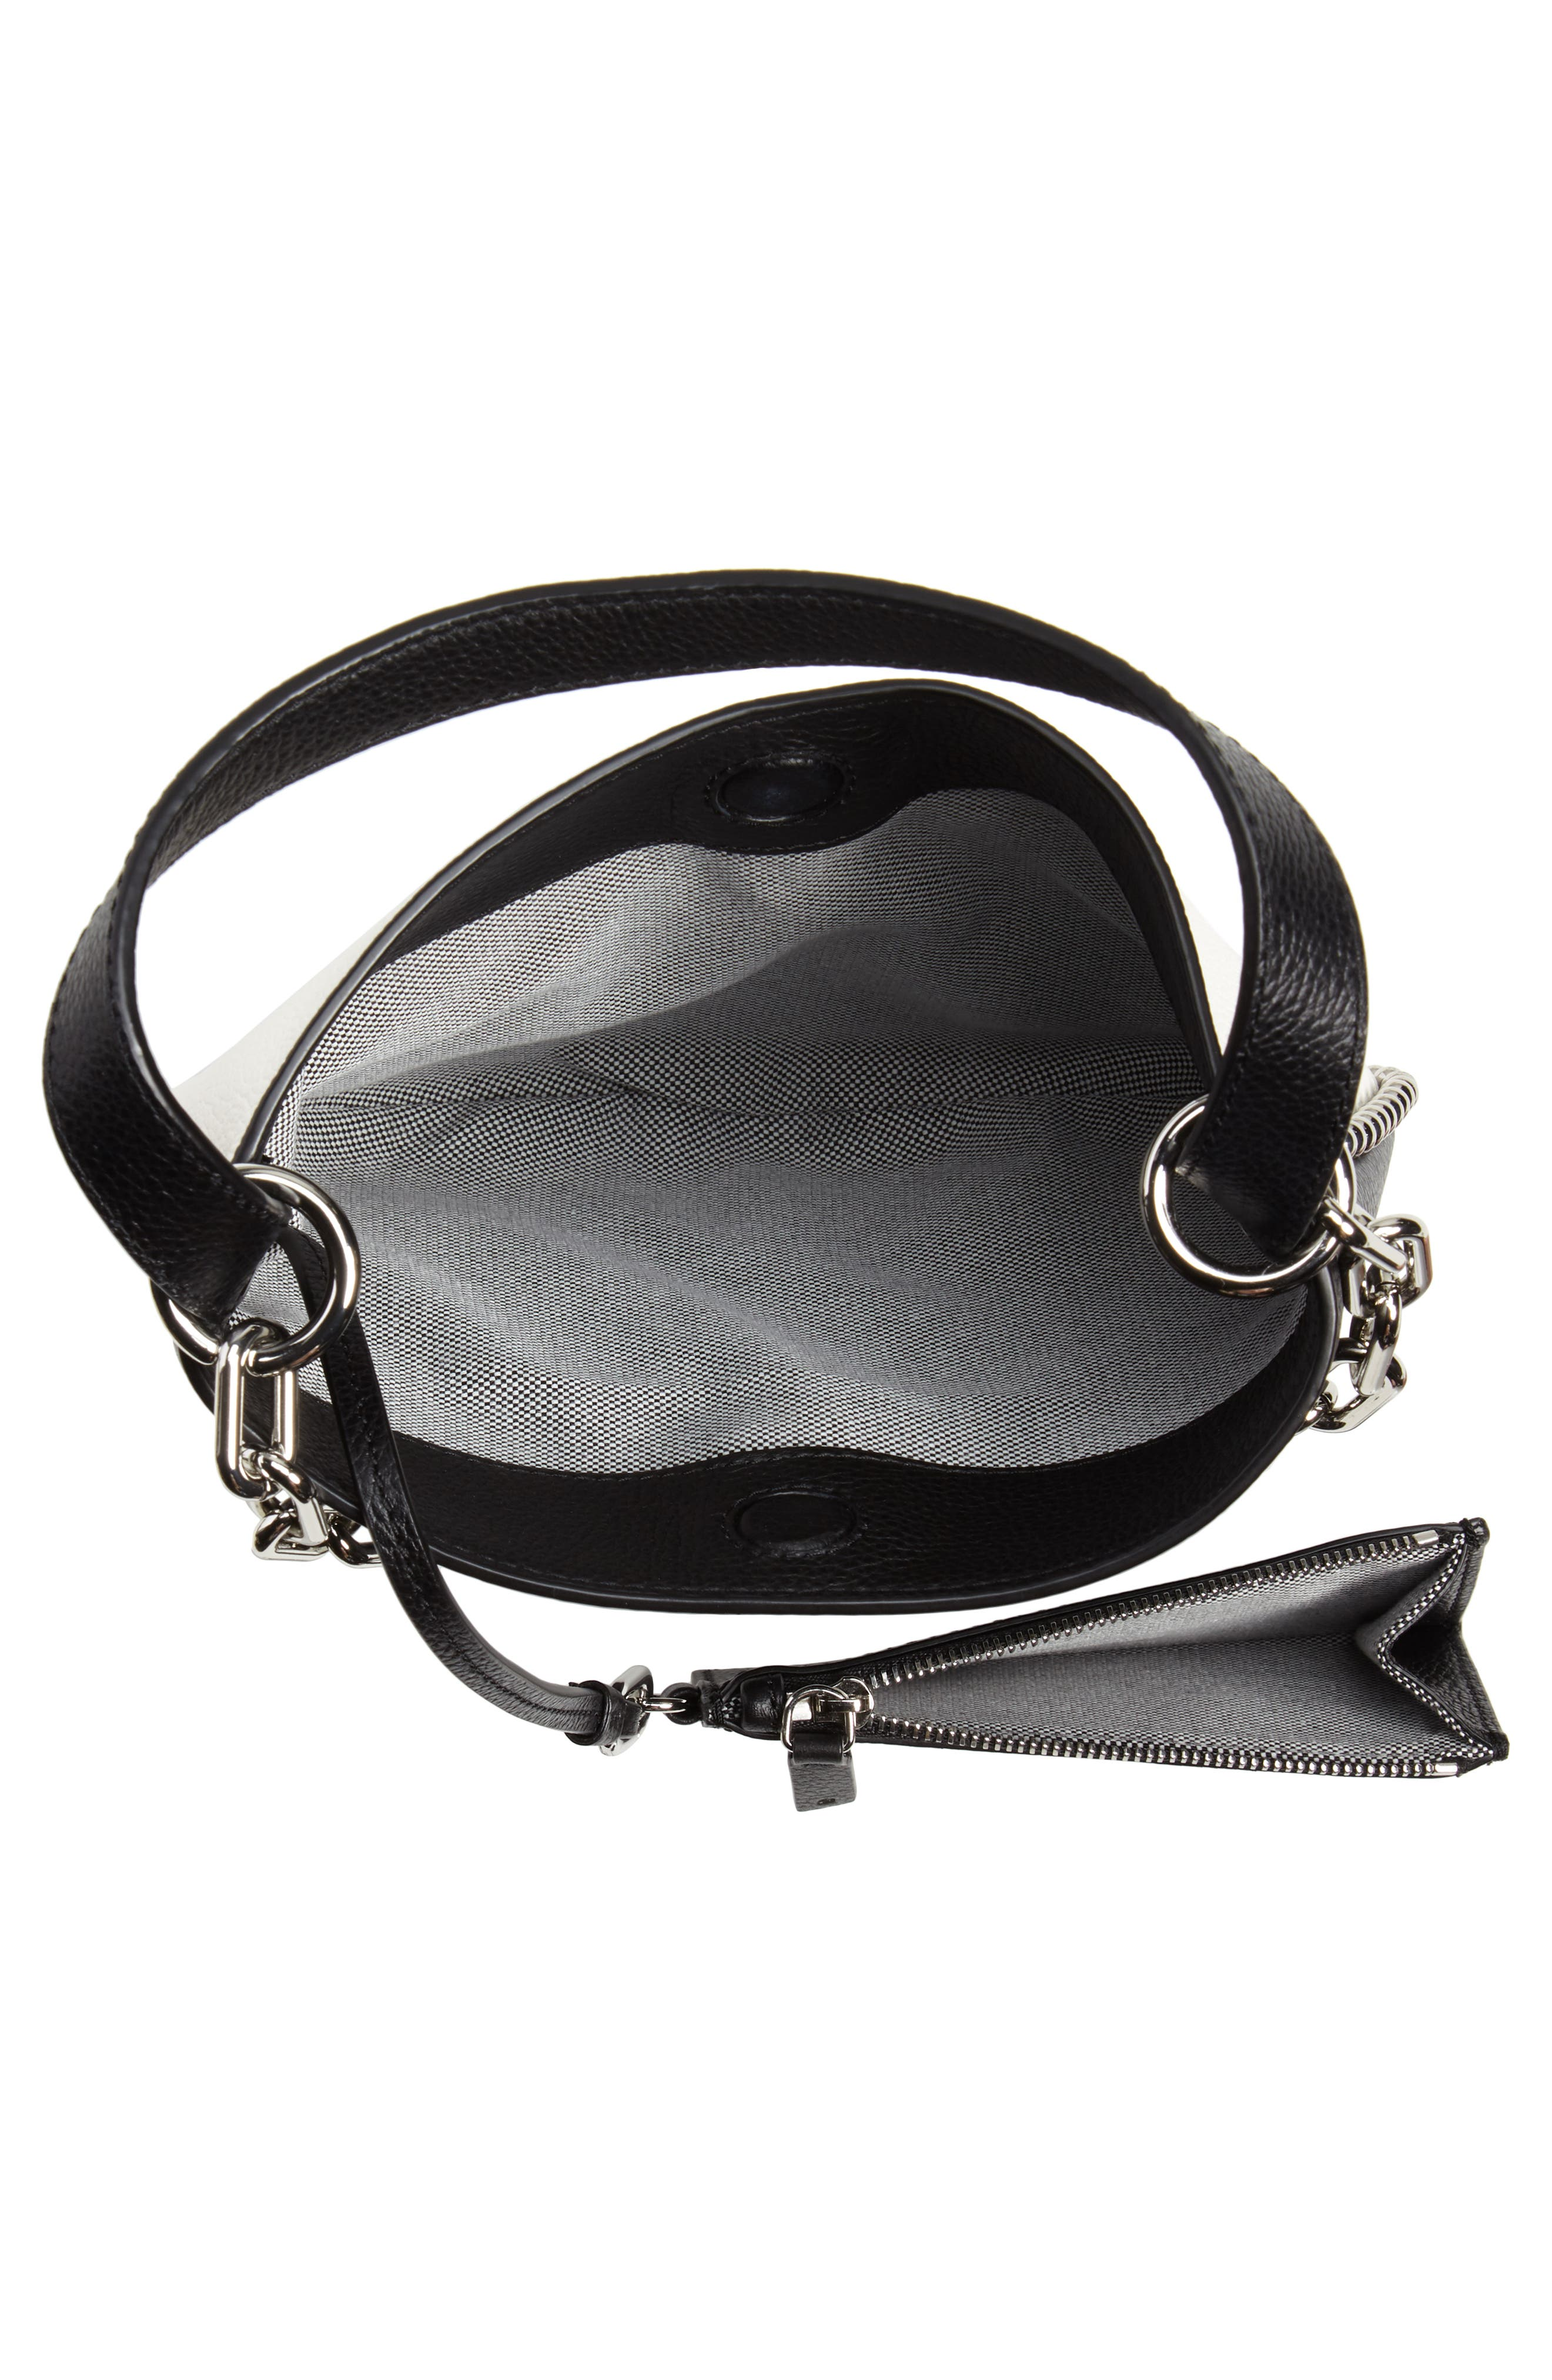 ALEXANDER WANG,                             Mini Roxy Leather Hobo Bag,                             Alternate thumbnail 5, color,                             BLACK/ WHITE